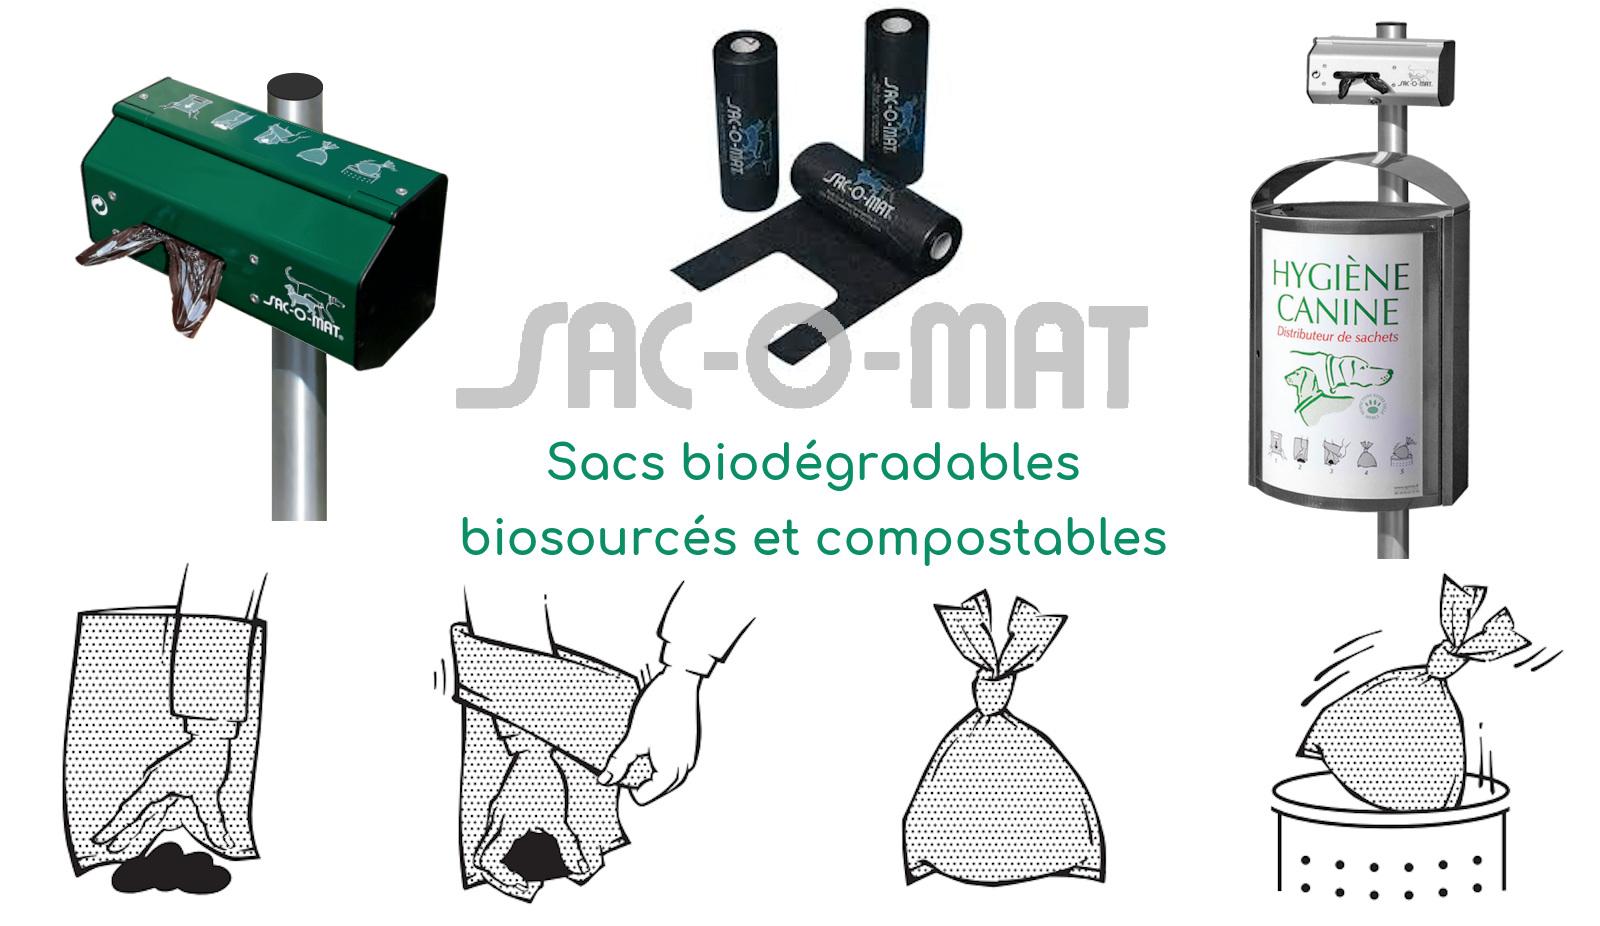 Sacs Déjections canines biodégradables - Tourcoing